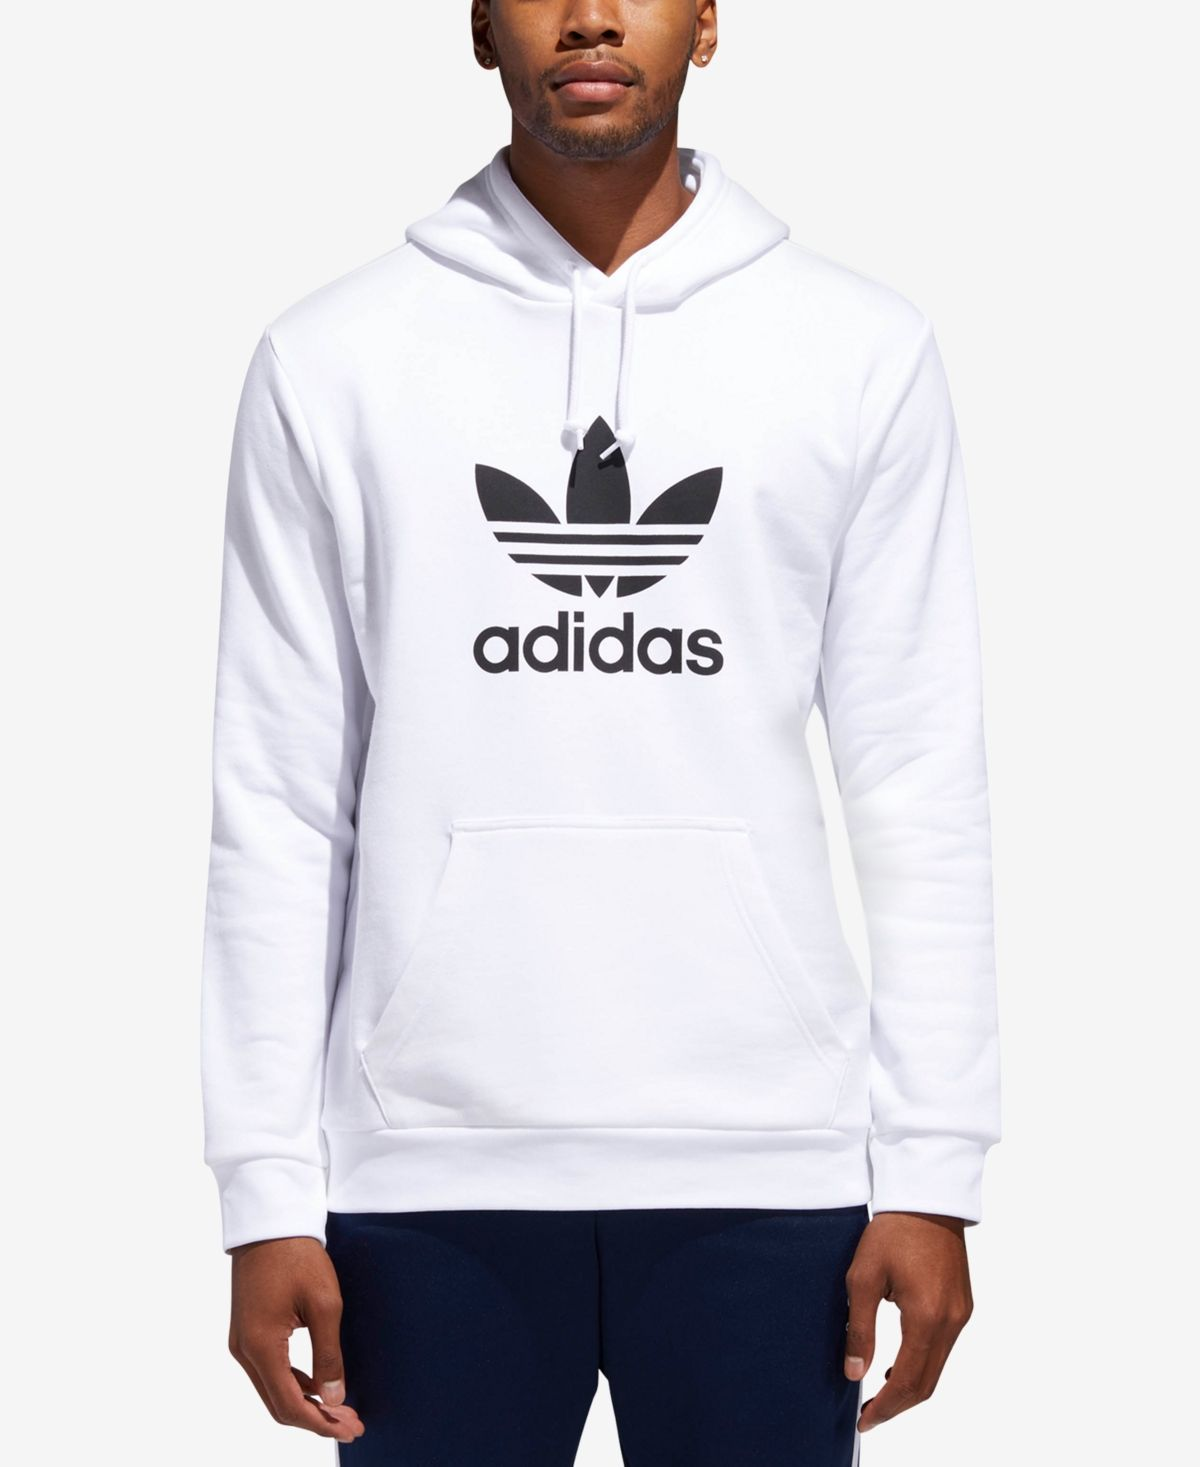 Adidas Men S Treifoil French Terry Hoodie Reviews Hoodies Sweatshirts Men Macy S In 2020 Adidas Men Mens Sweatshirts French Terry Hoodie